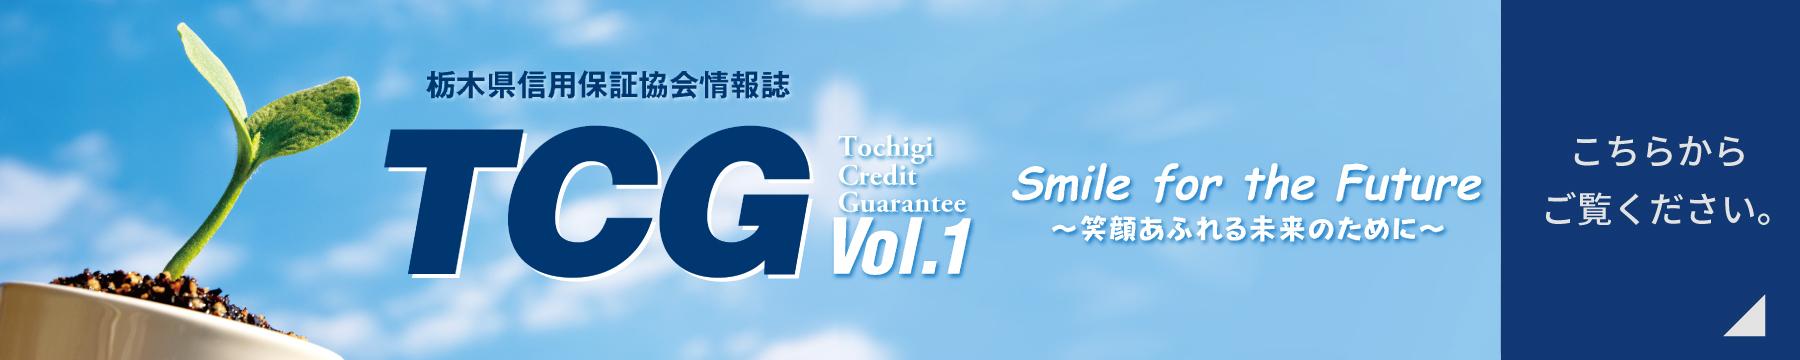 TCG Vol.1